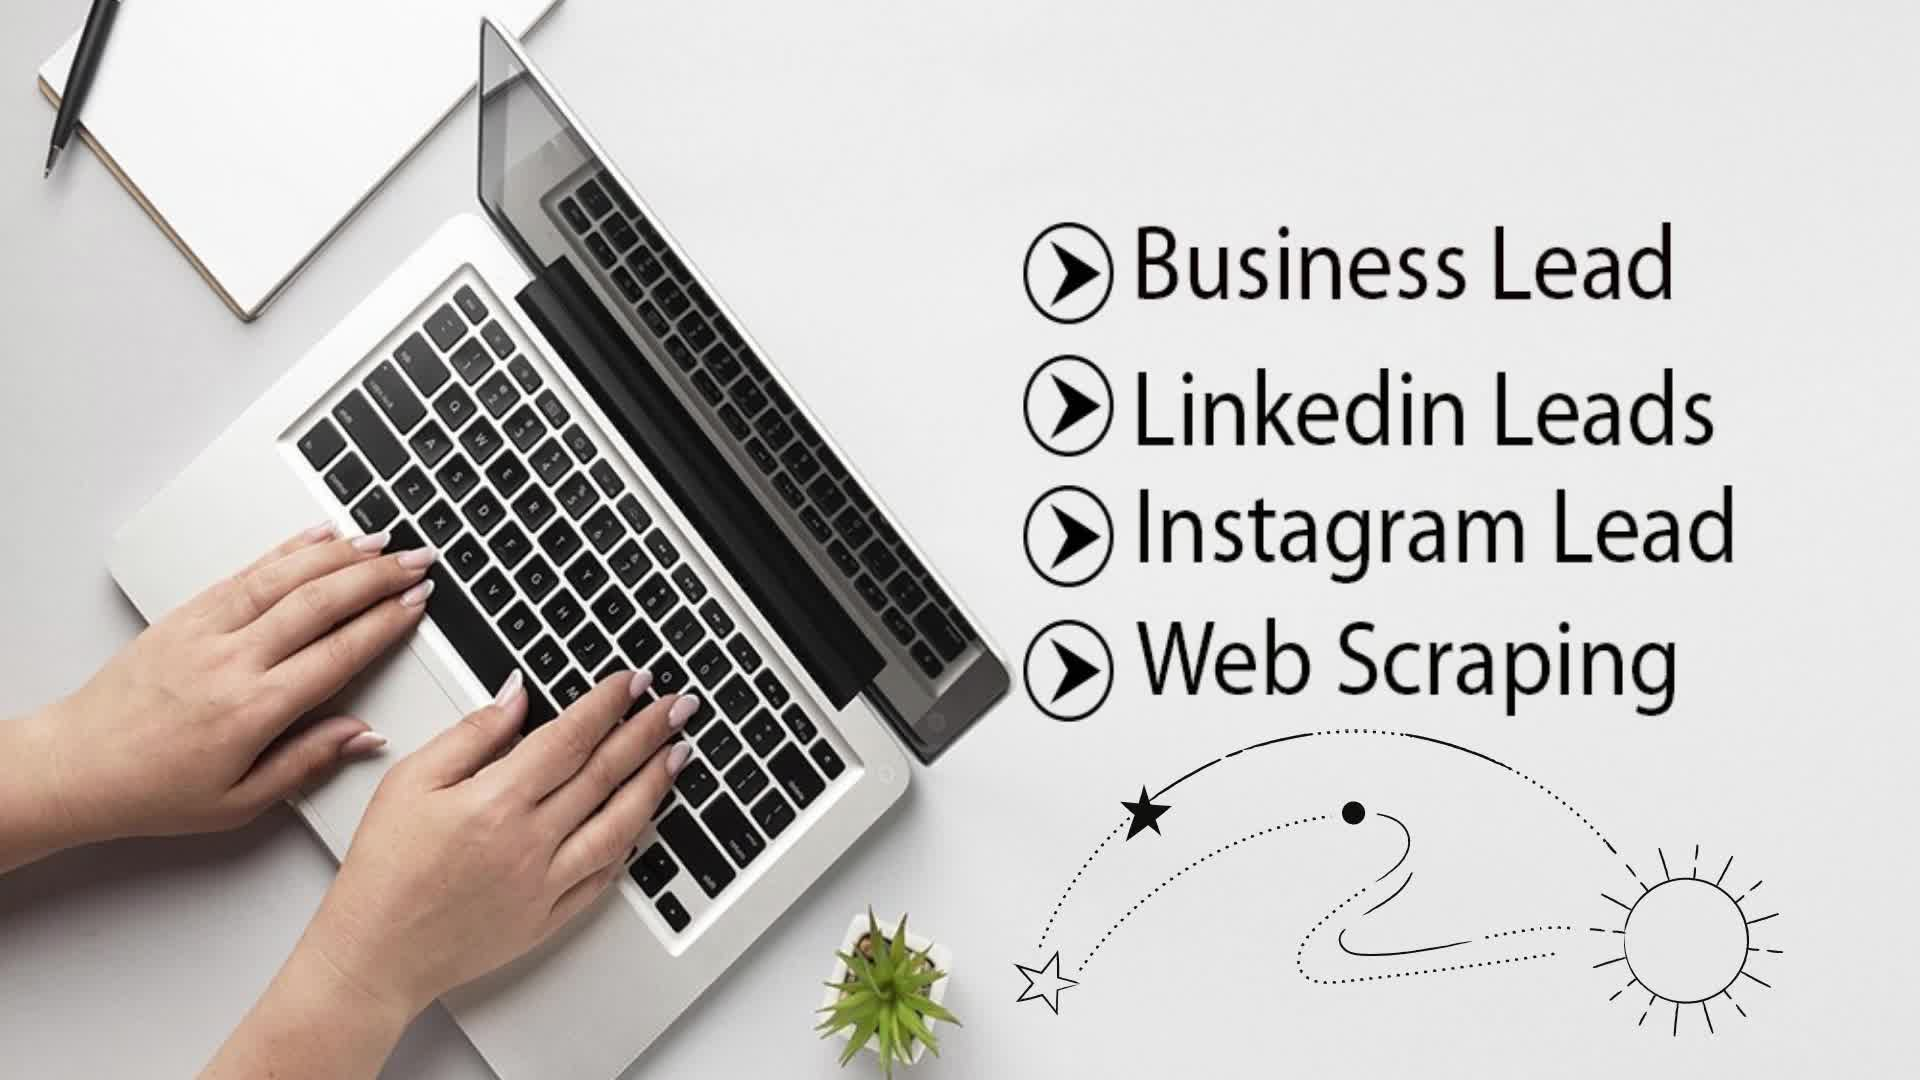 professional-business-freelancer-image-95743